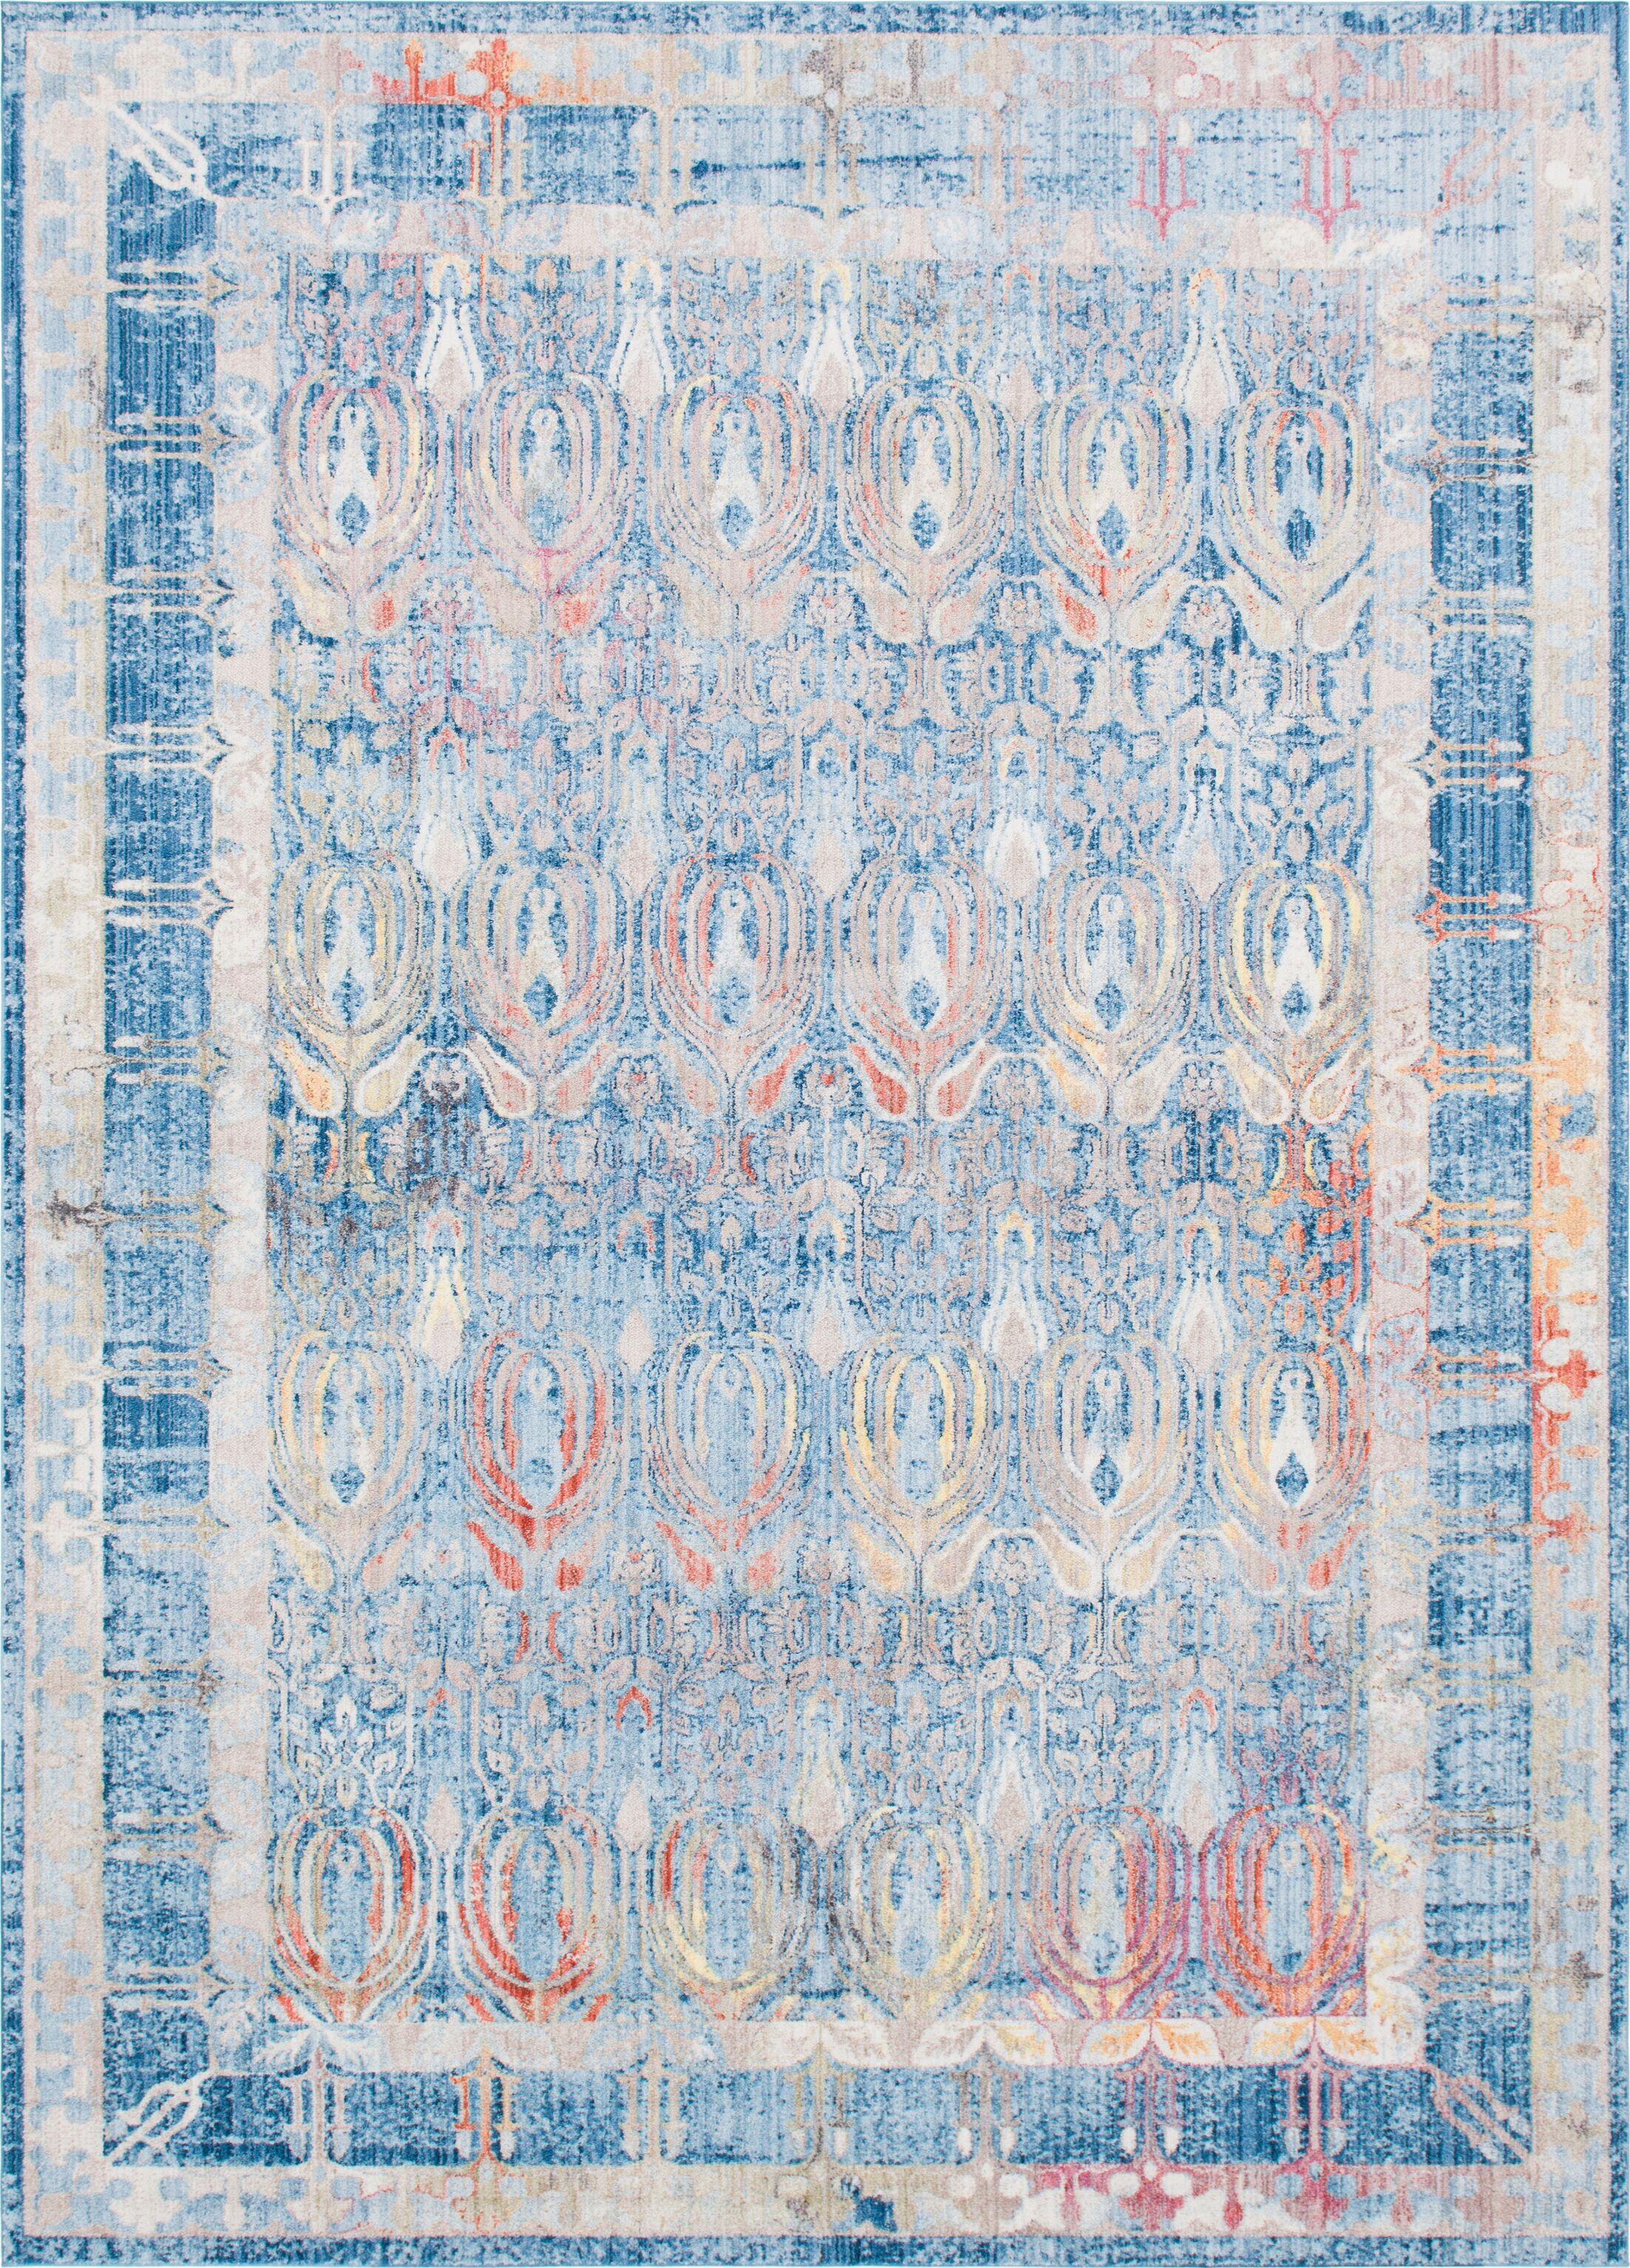 Gomez Blue/Gold Area Rug Rug Size: Rectangle 9' x 12'